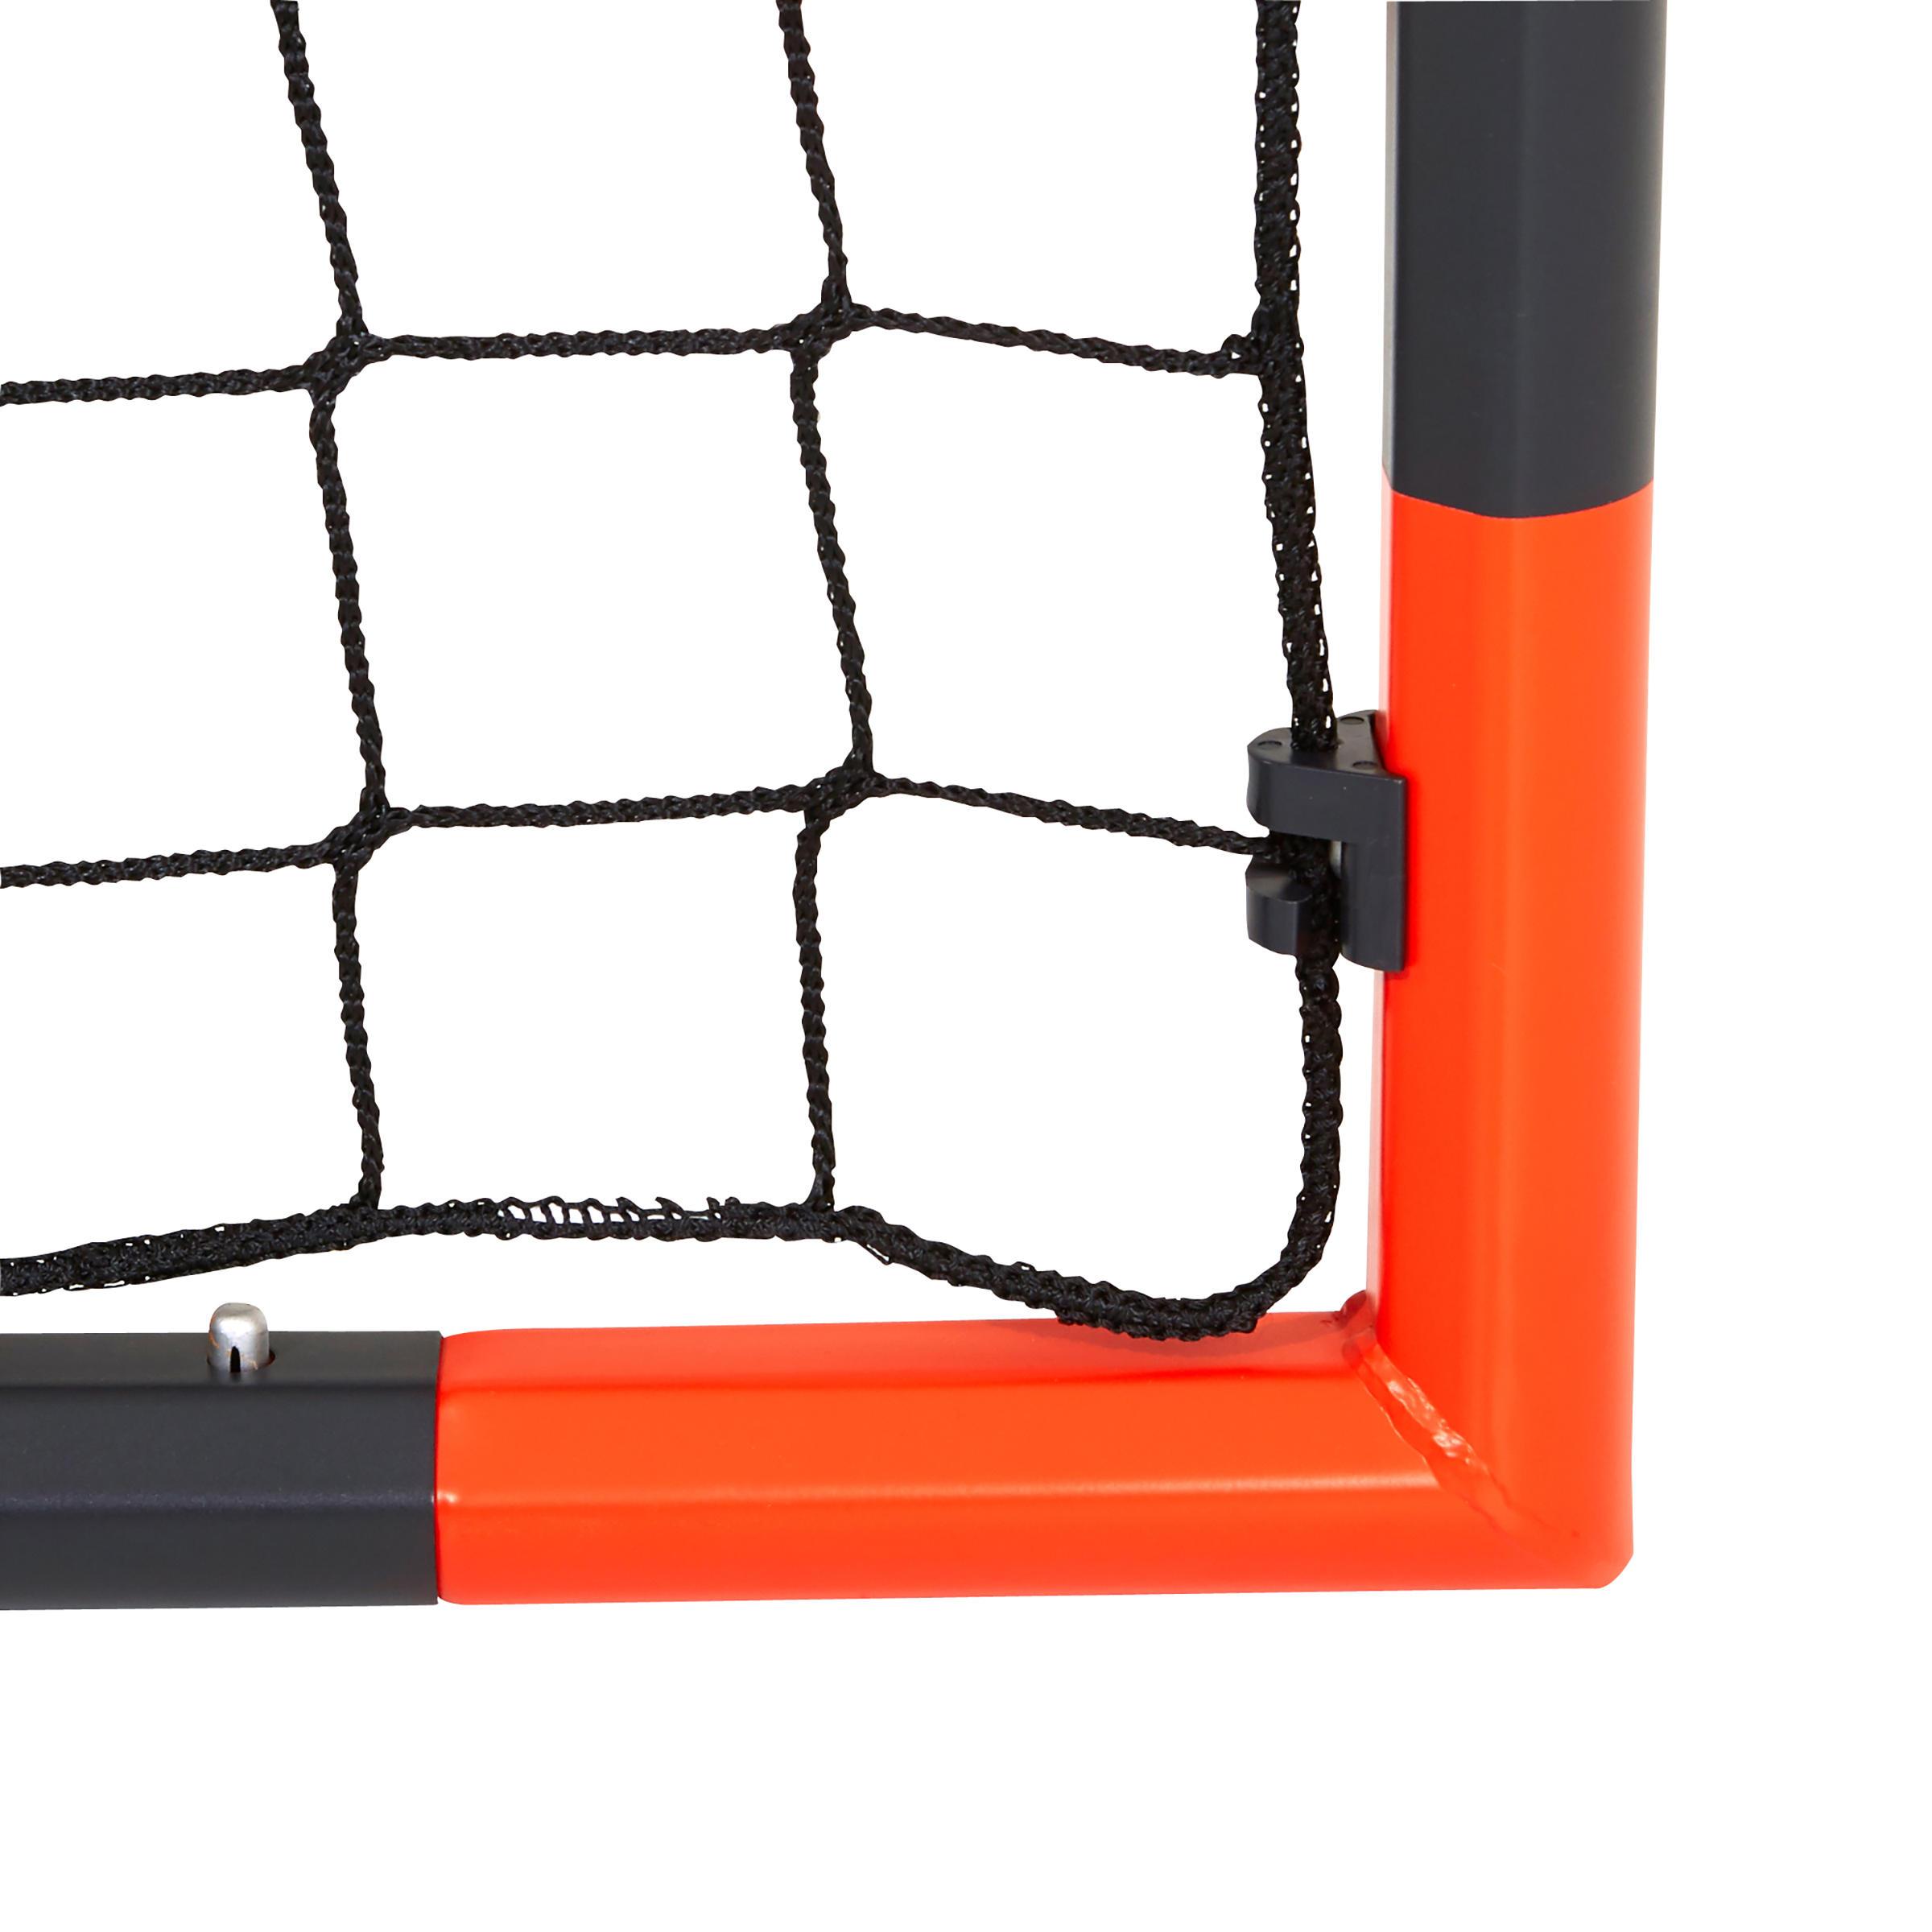 Classic Goal Football Goal Size S - Grey/Orange